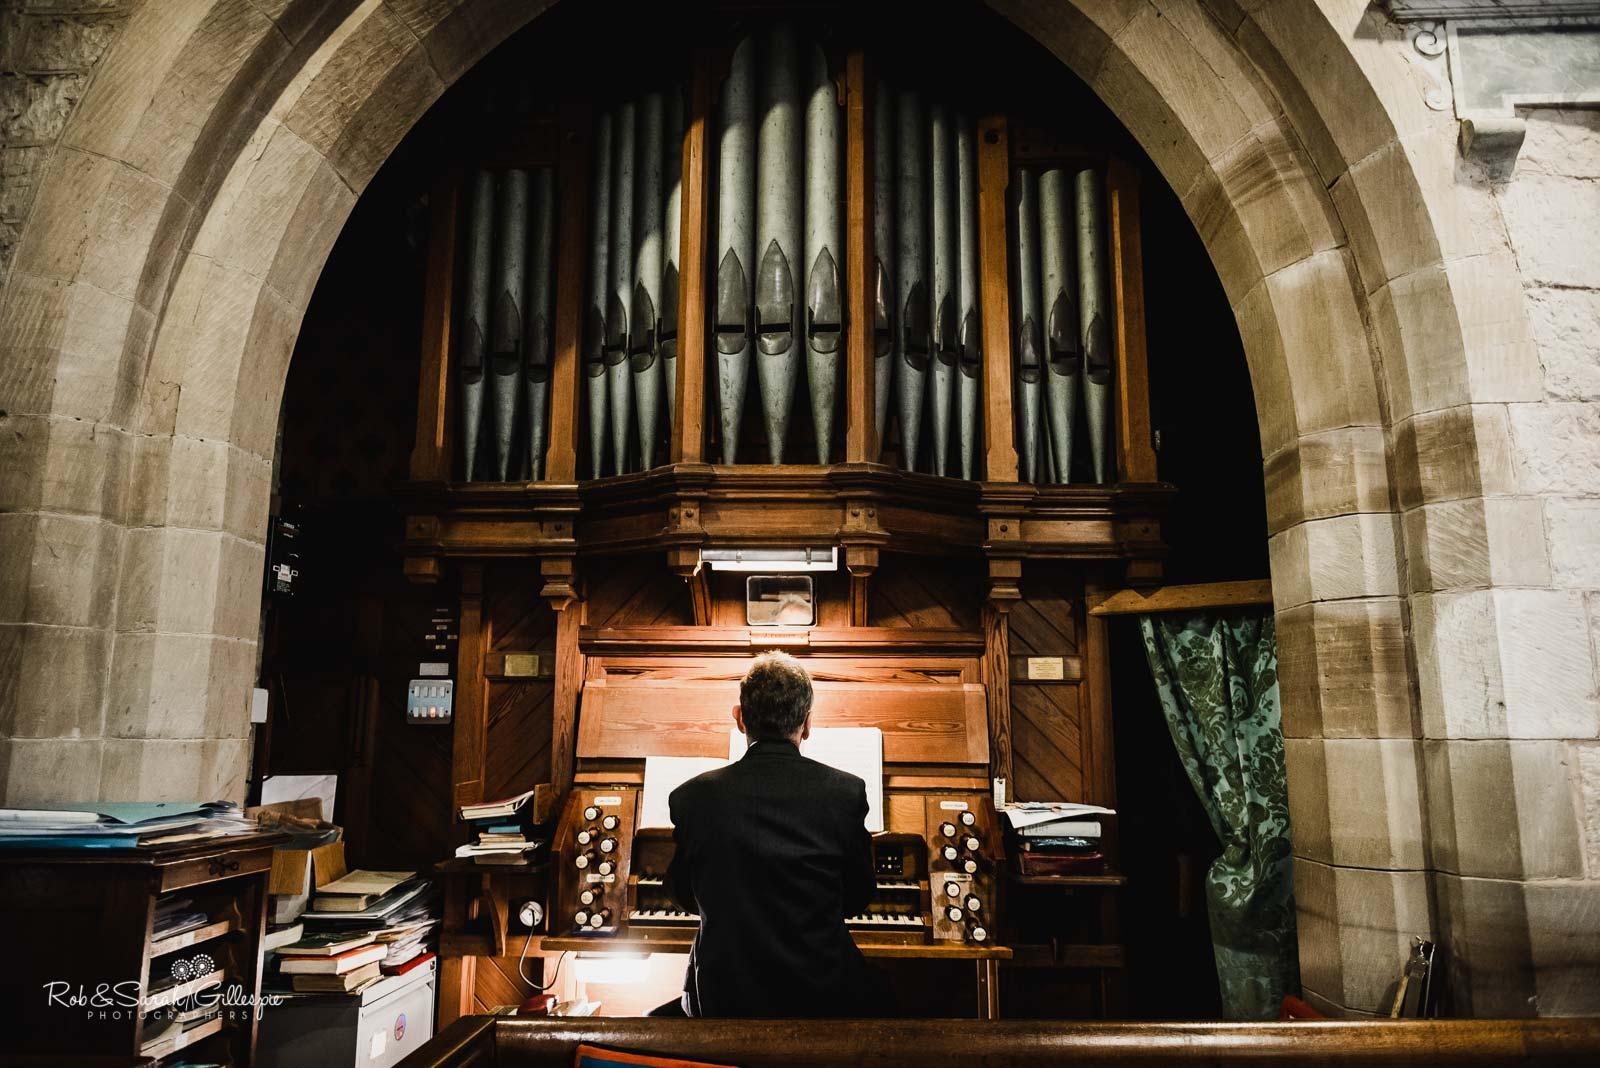 Church organ at St Giles church Packwood